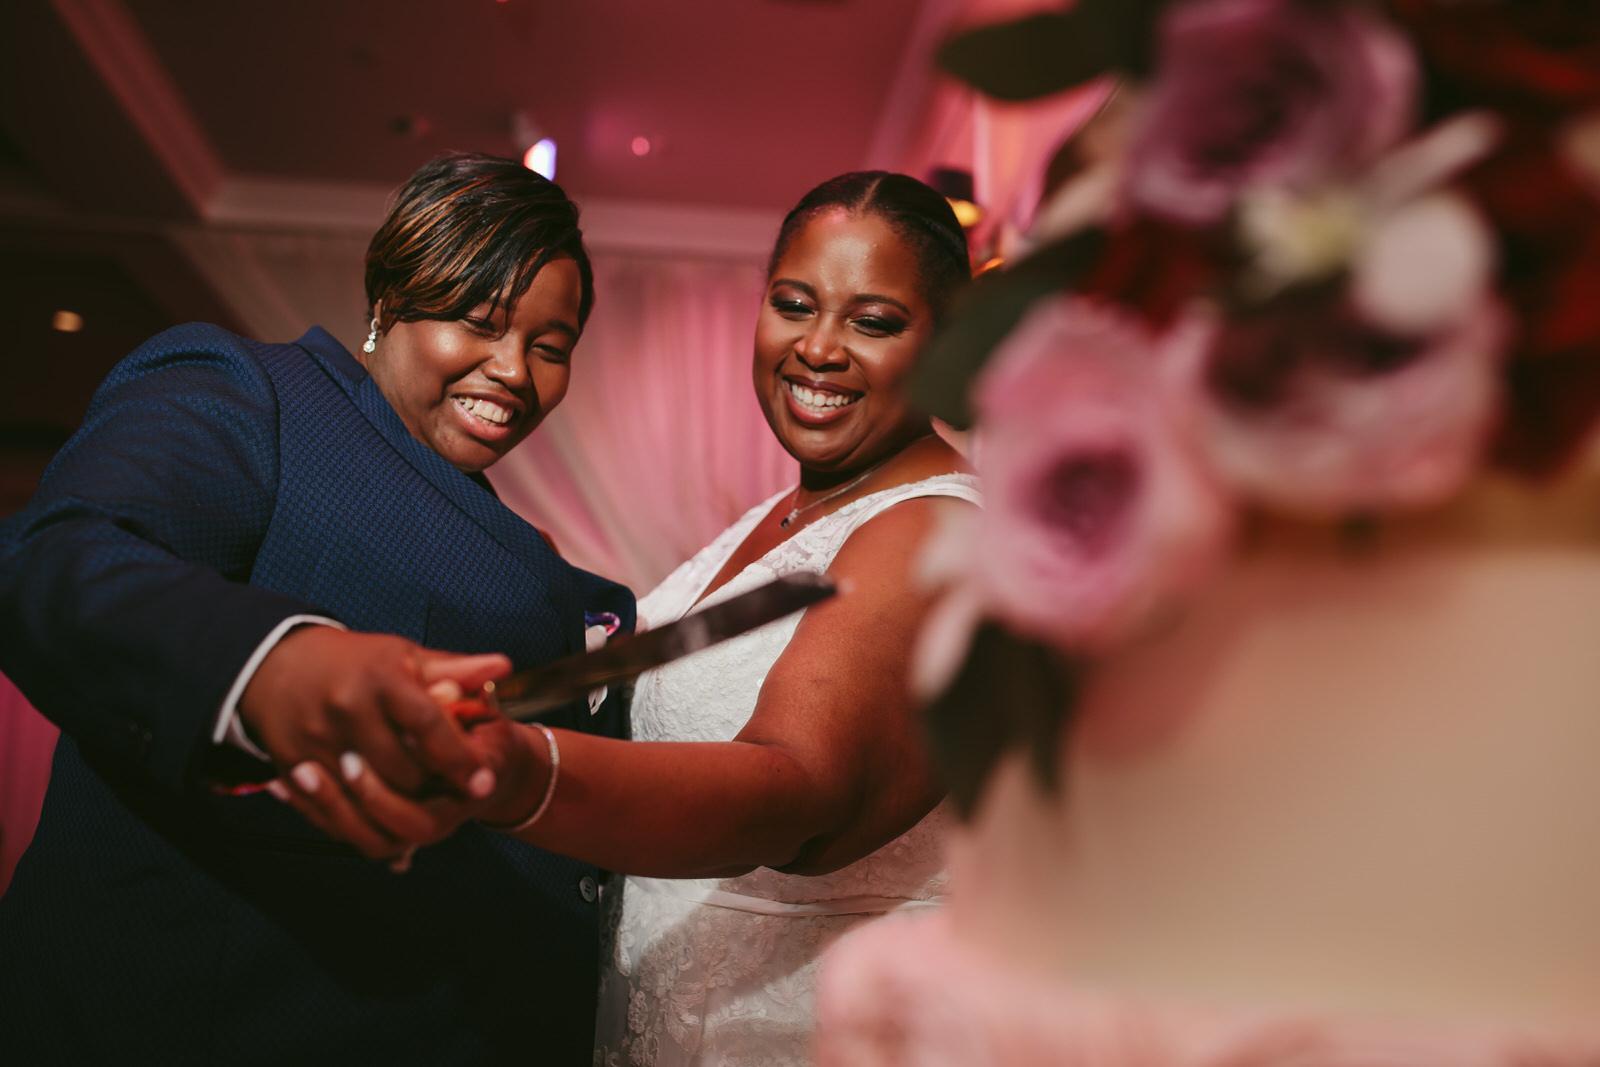 Cake_Cutting_Benvenuto_Wedding_Reception_Tiny_House_Photo.jpg